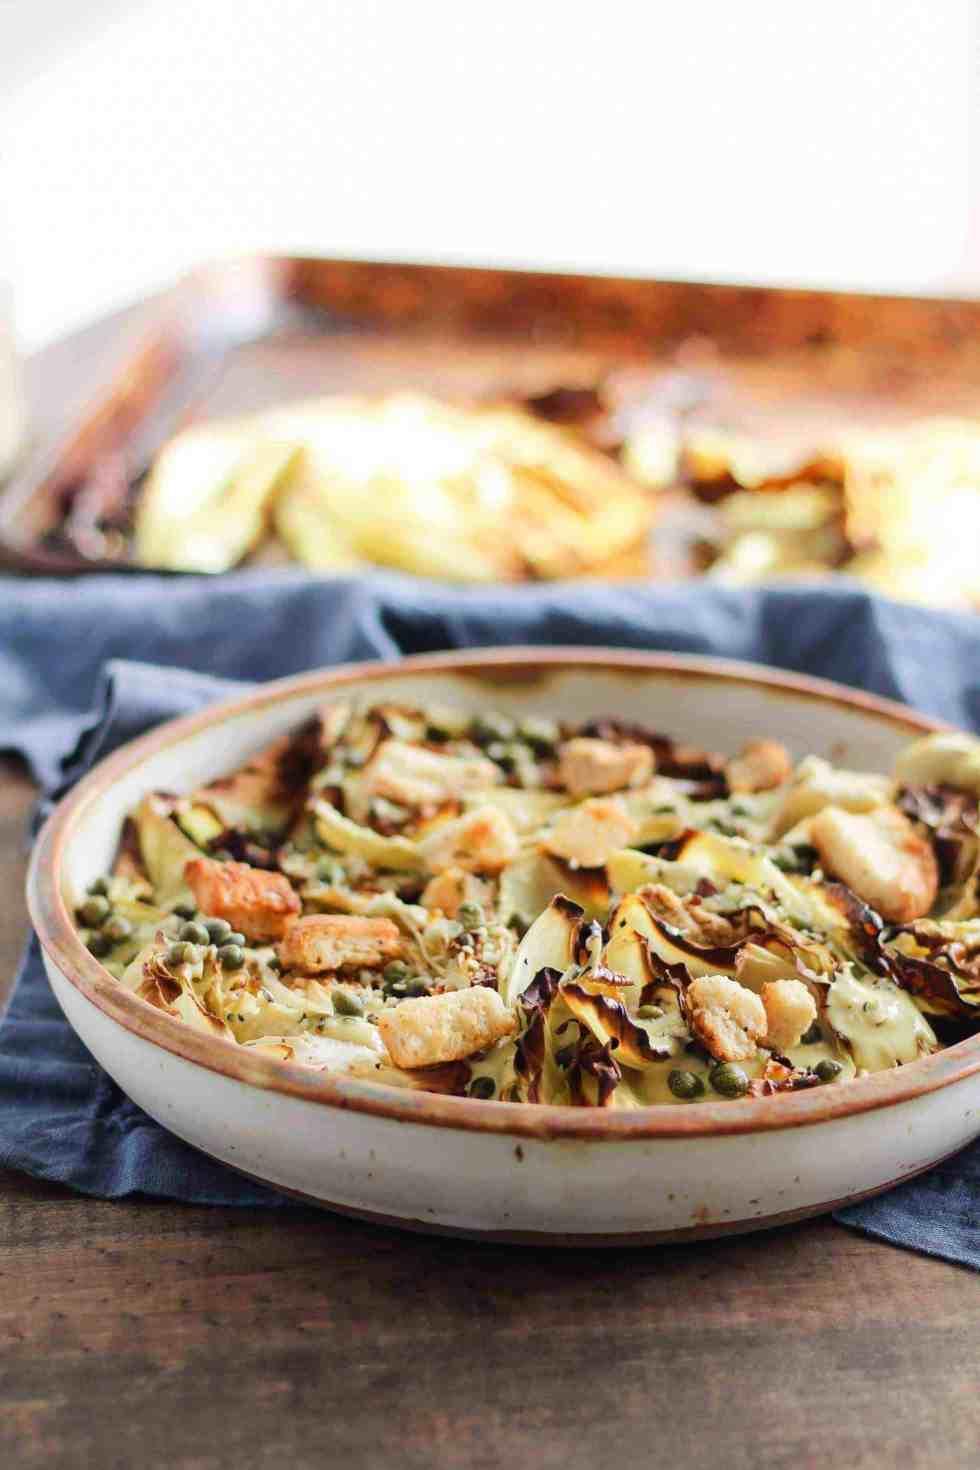 Cabbage salad with vegan Caesar dressing.